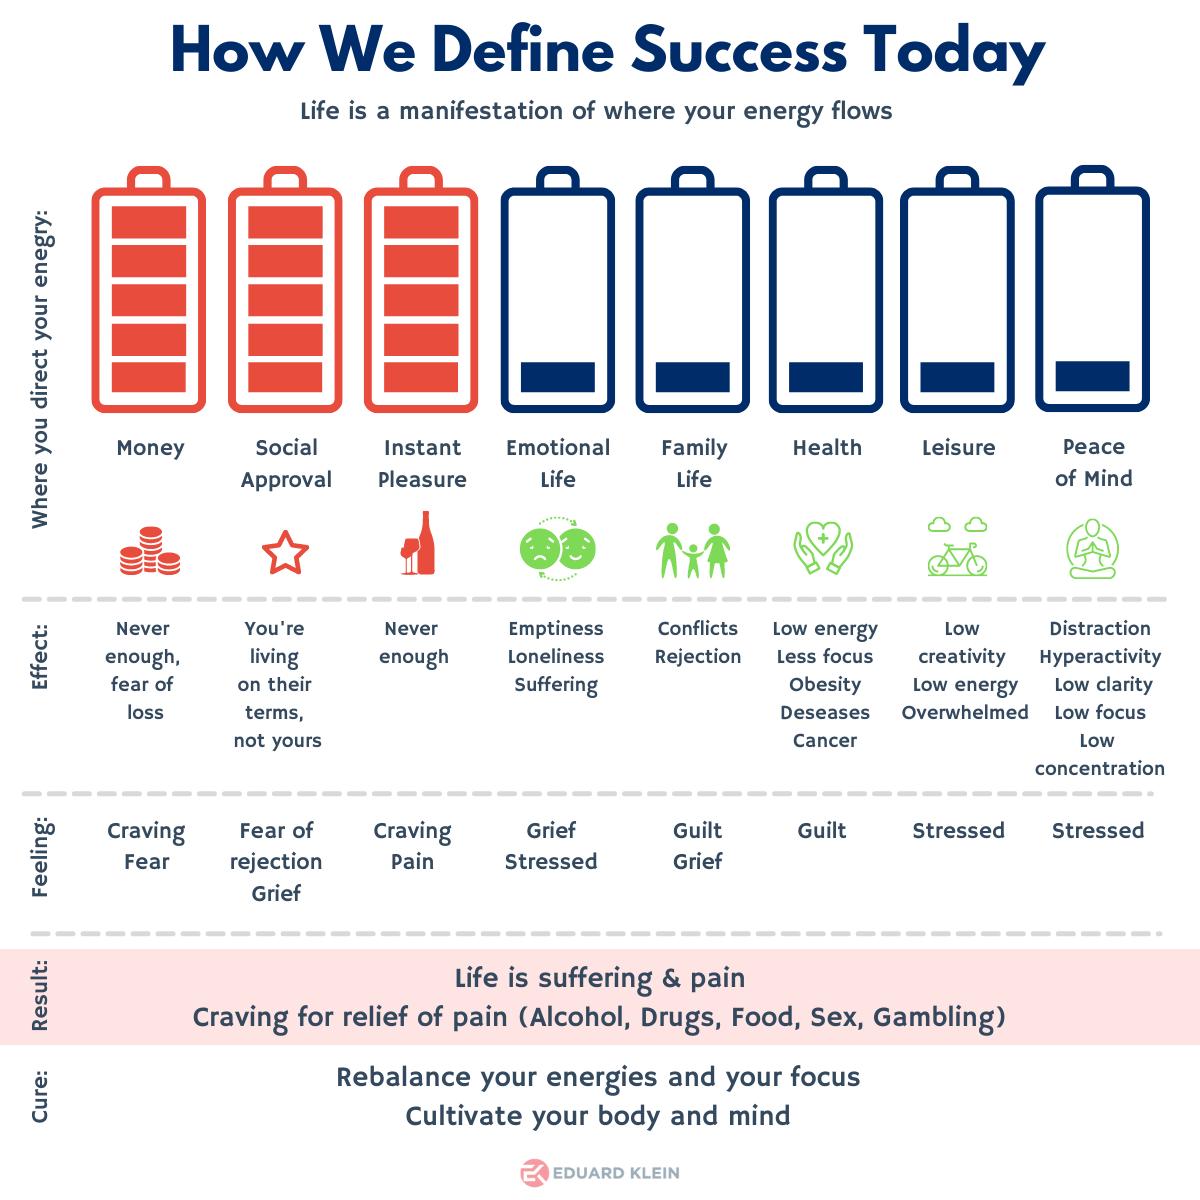 How we define success today